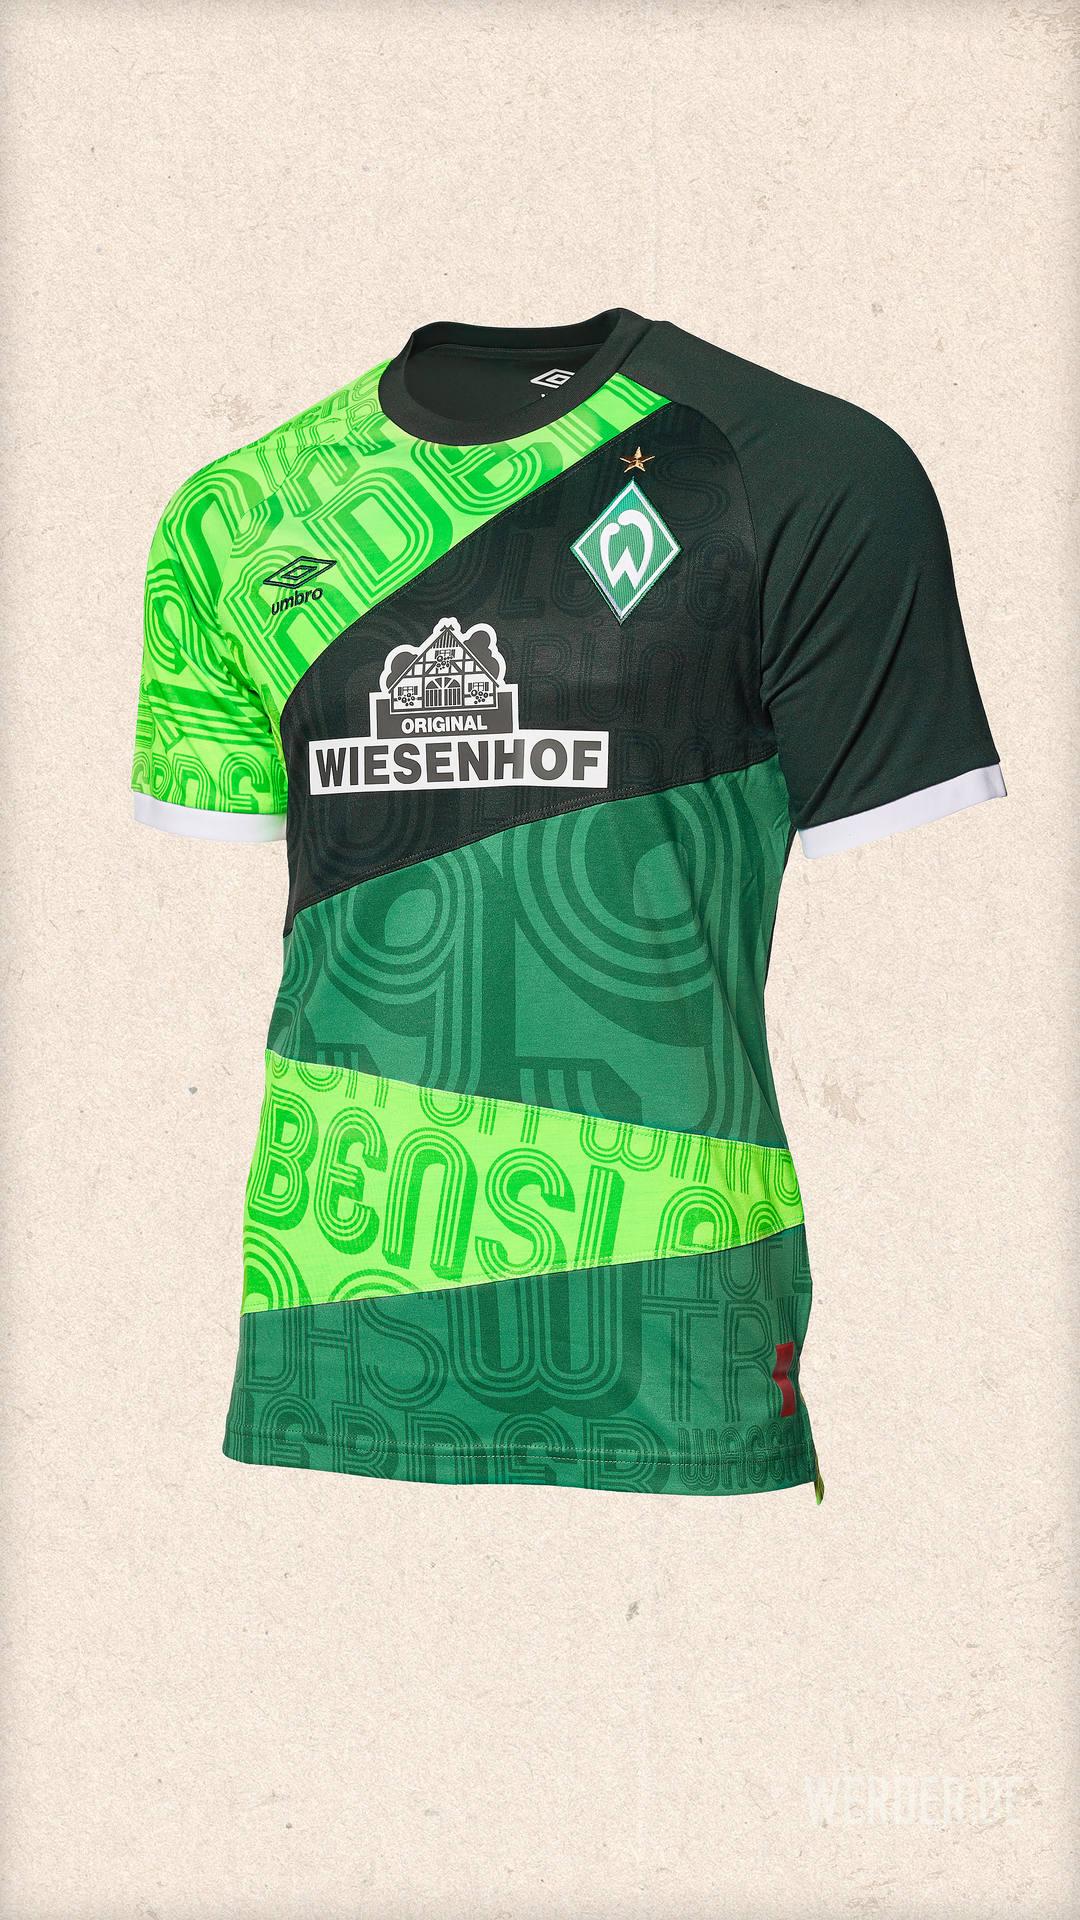 maillot-mashup-werder-breme-120-ans-5